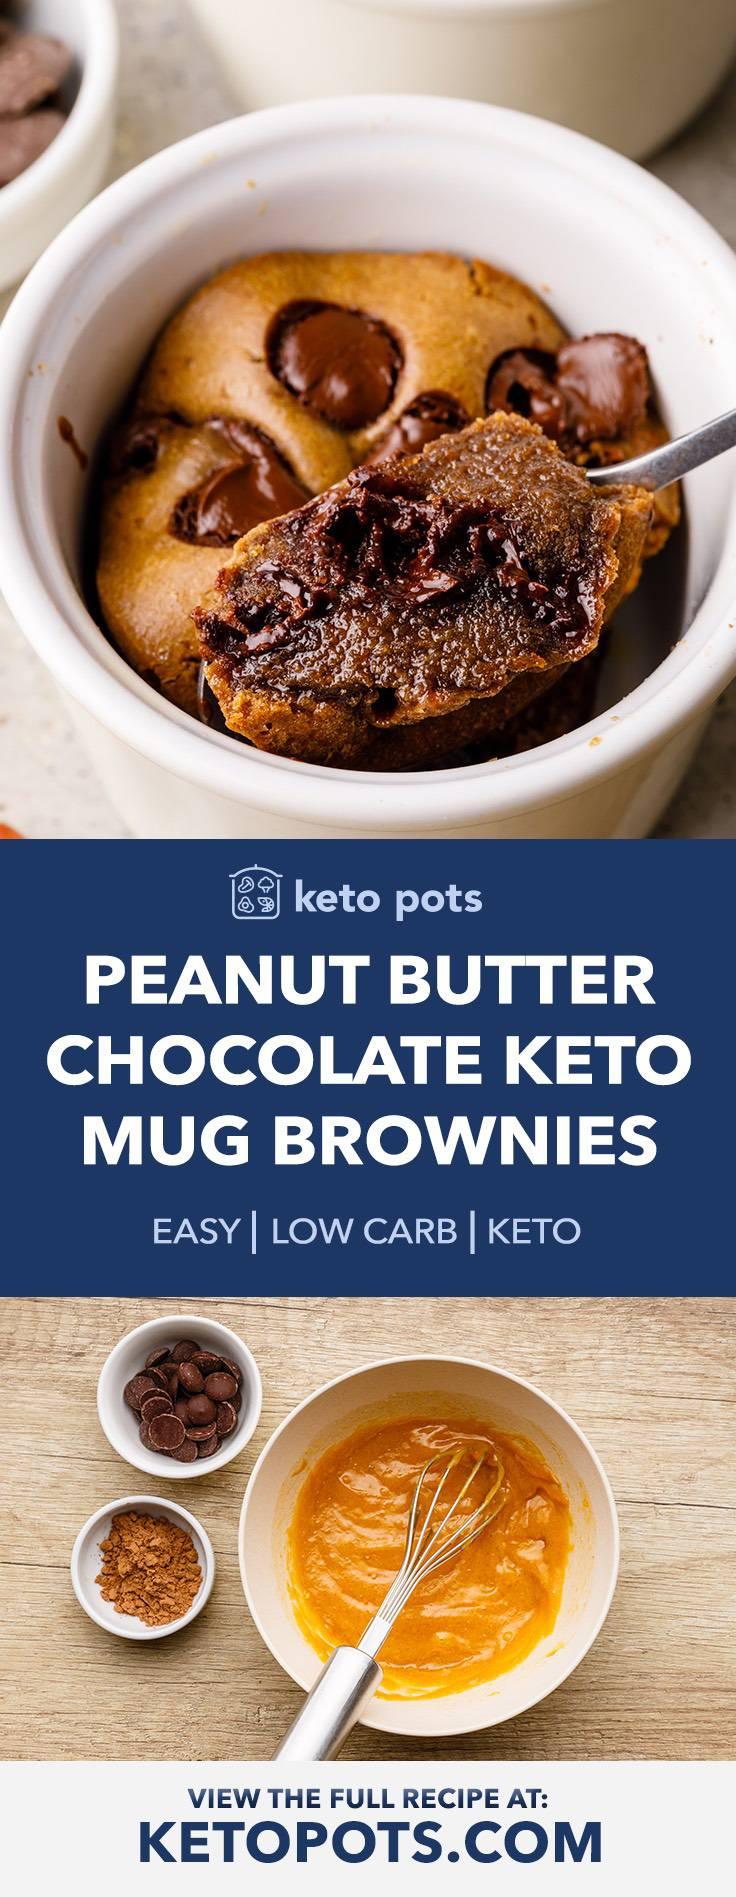 Gooey Peanut Butter and Chocolate Mug Brownies